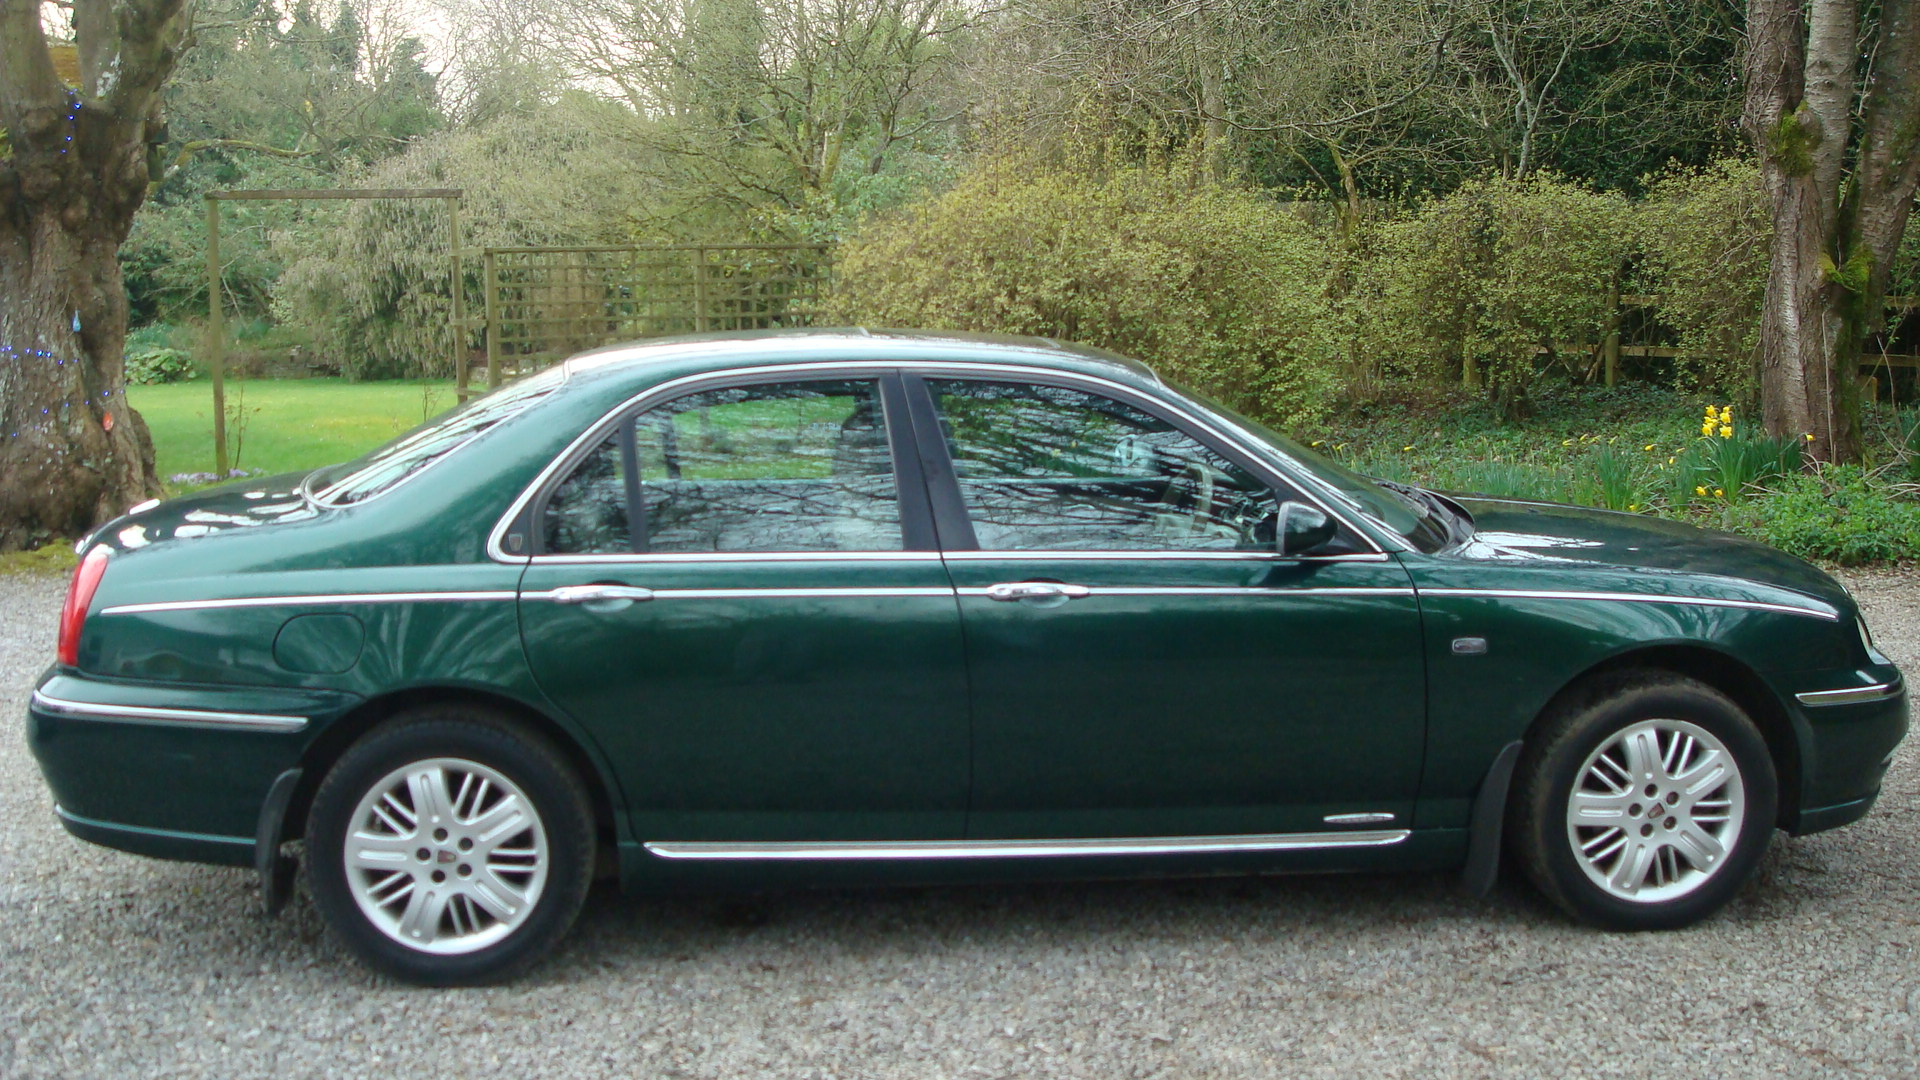 Range Rover Austin >> Rover 75 2.0 V6 Club SE Saloon - Country Classics : Country Classics